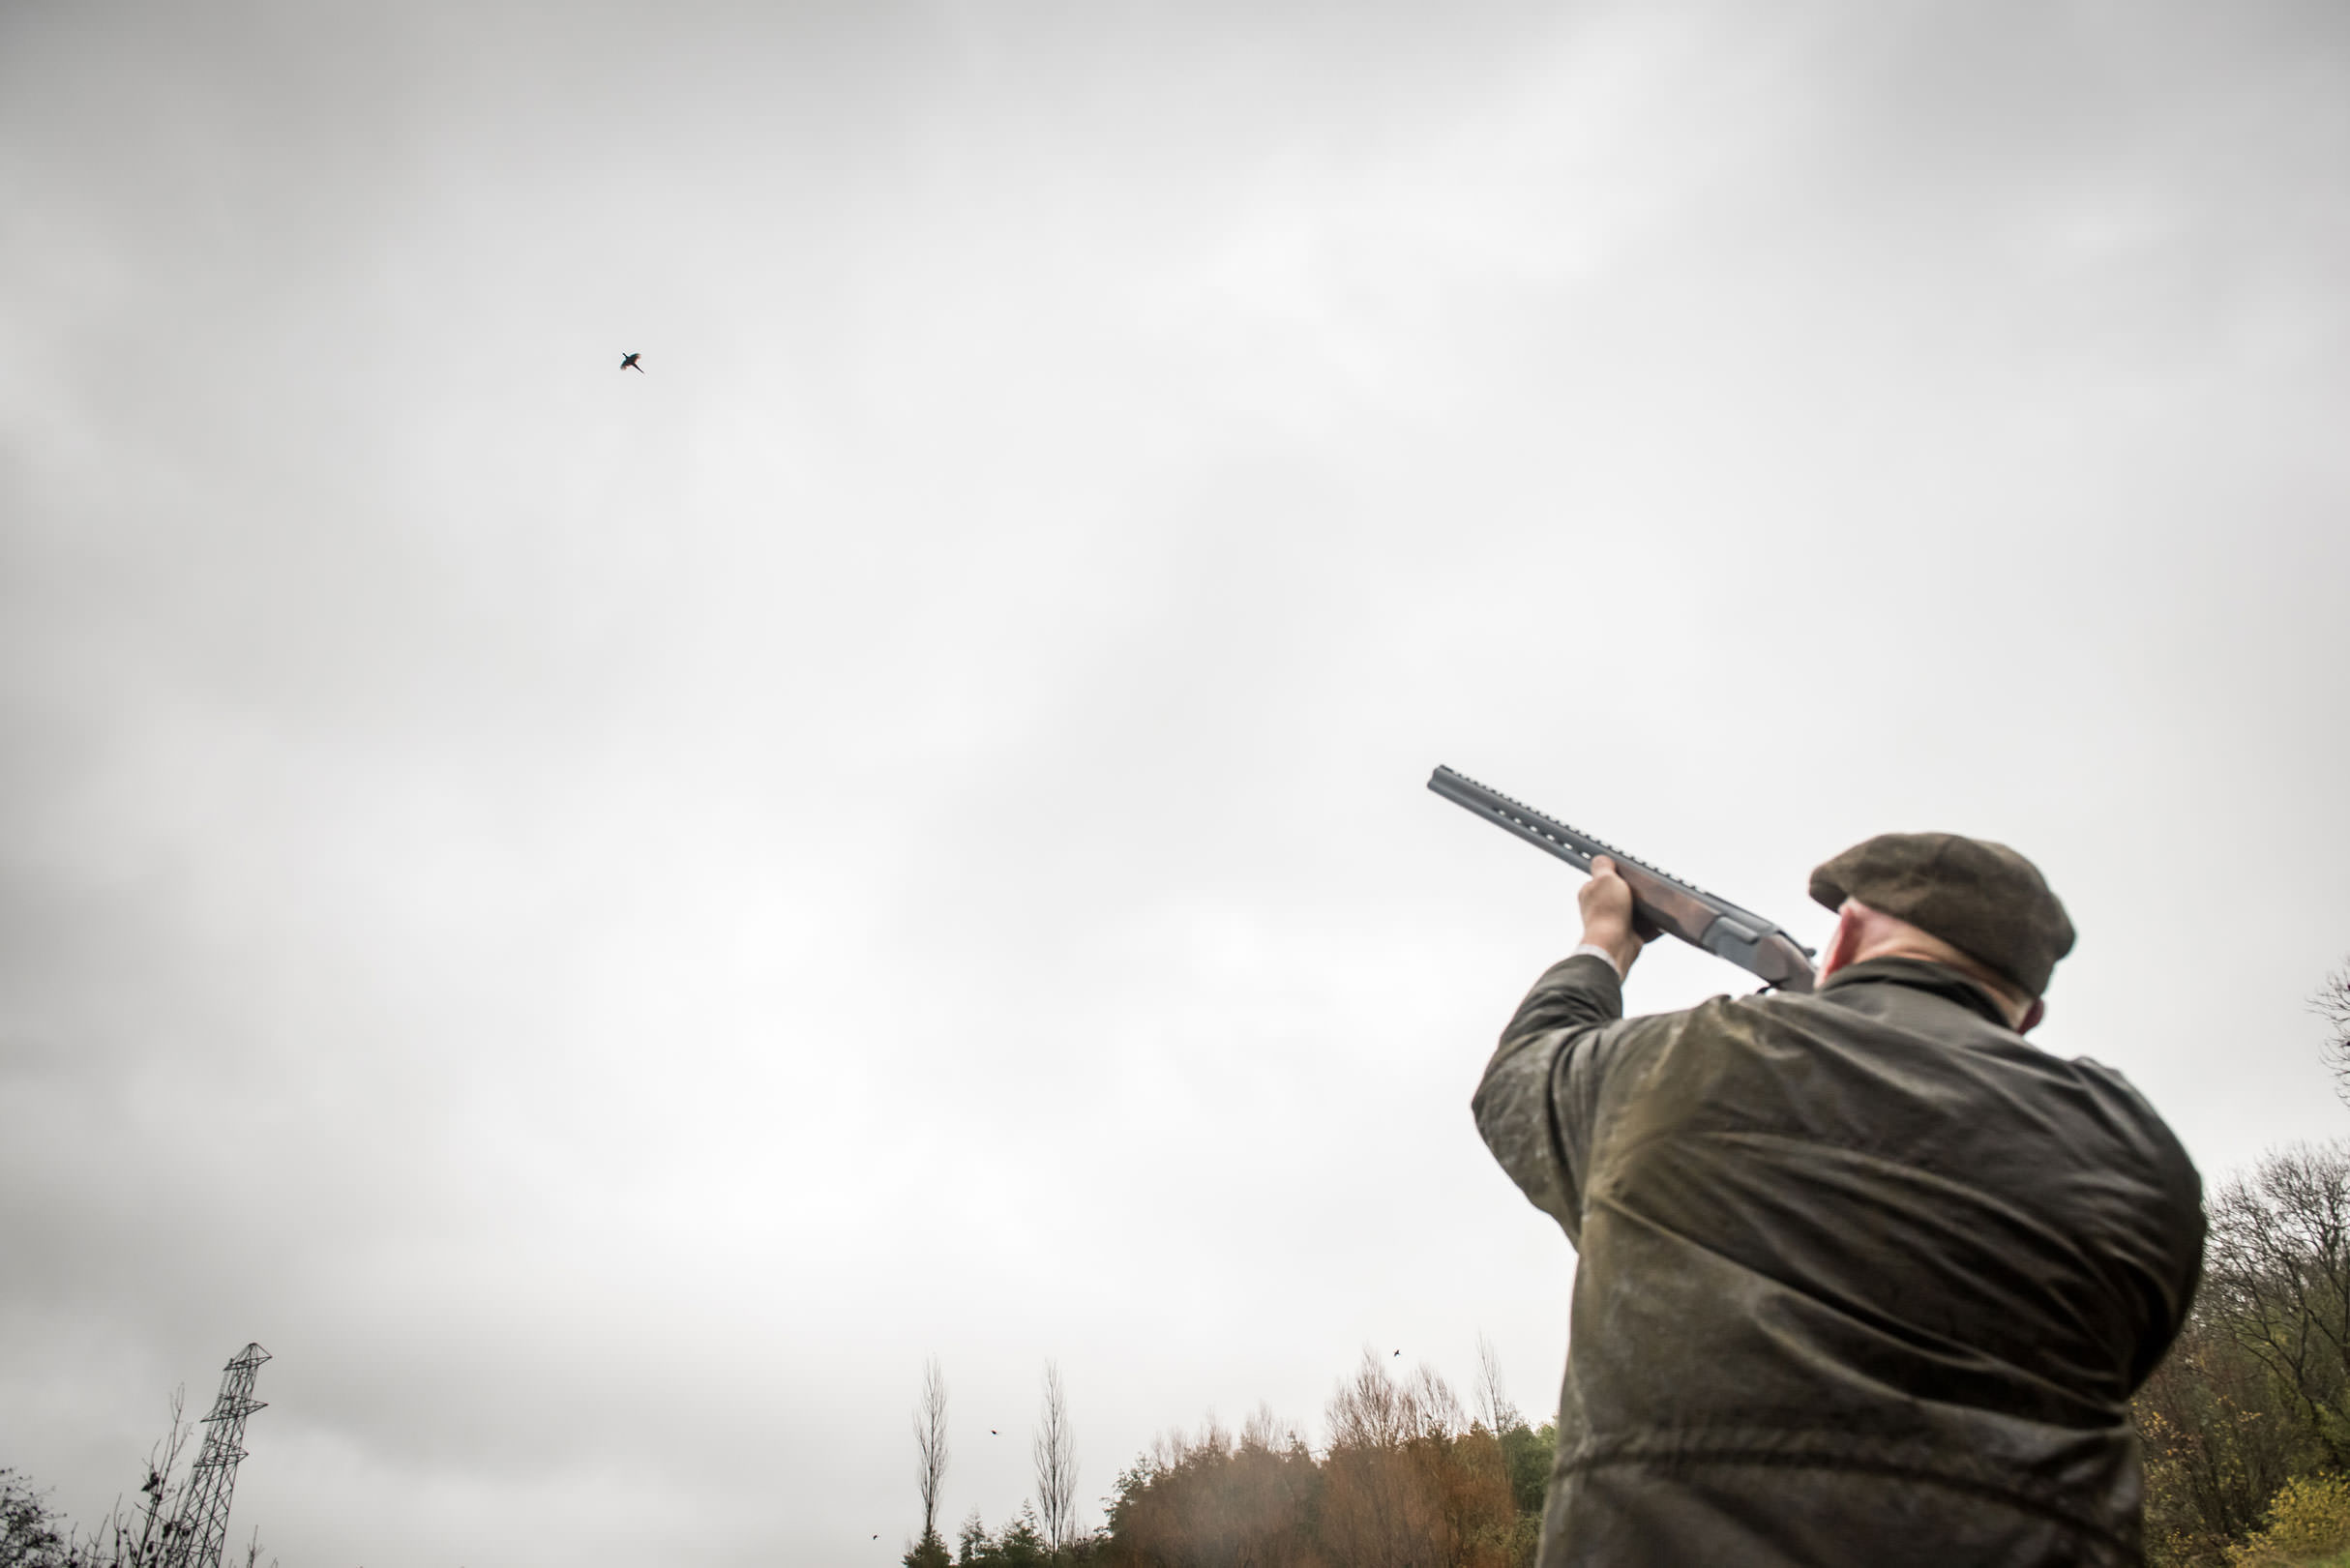 A man takes aim at a pheasant with his shotgun during a game shooting drive